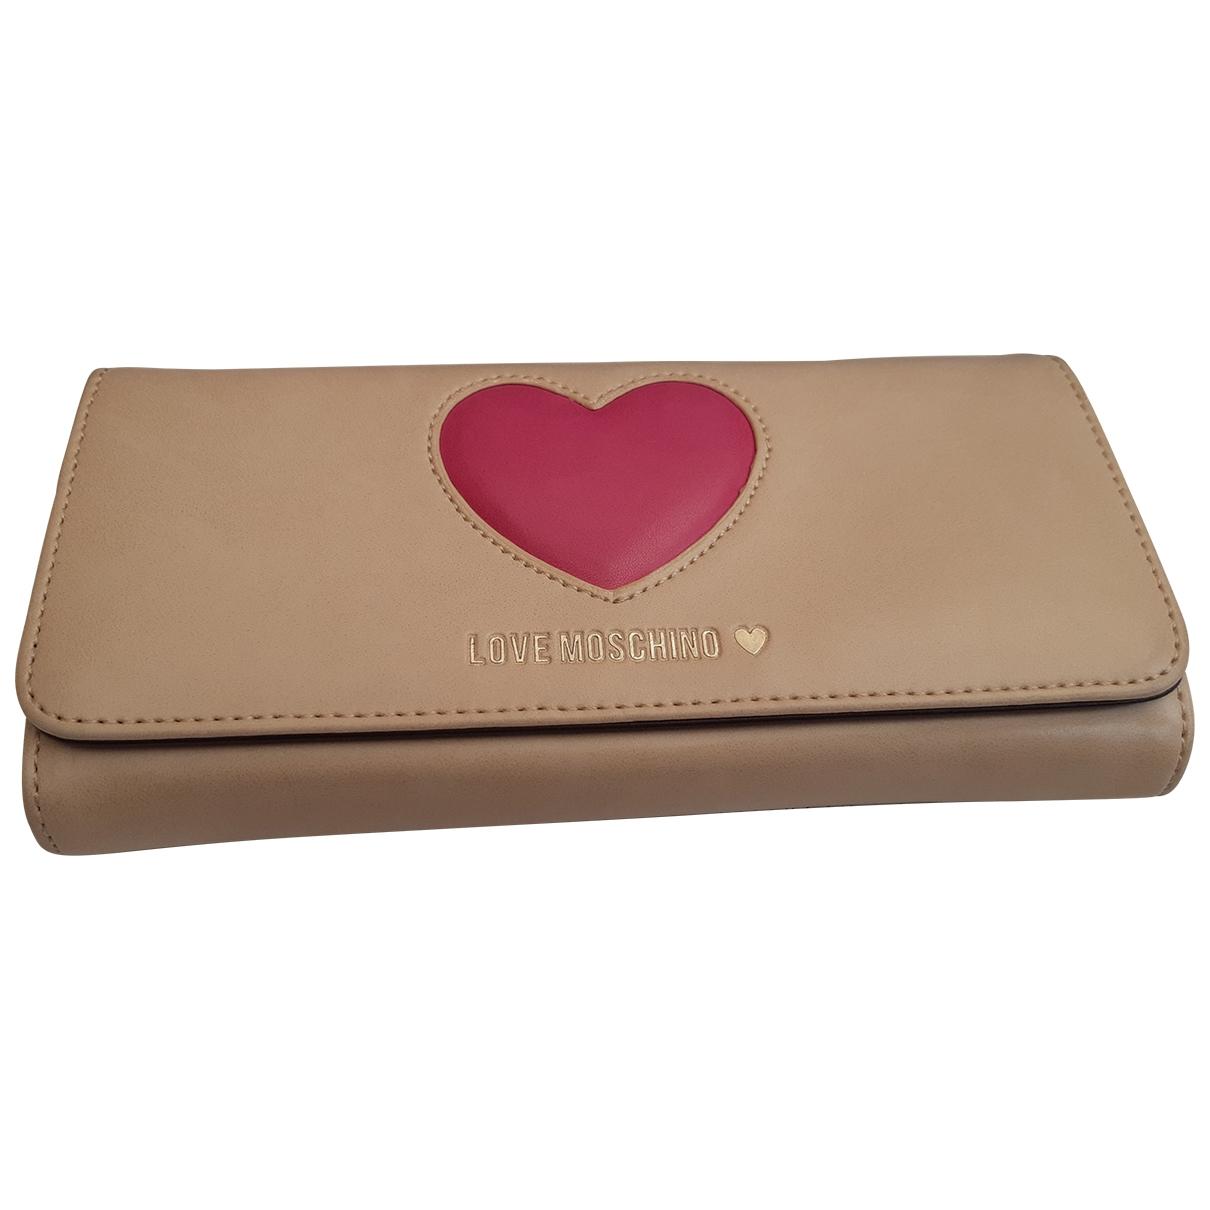 Moschino Love - Portefeuille   pour femme en cuir - ecru